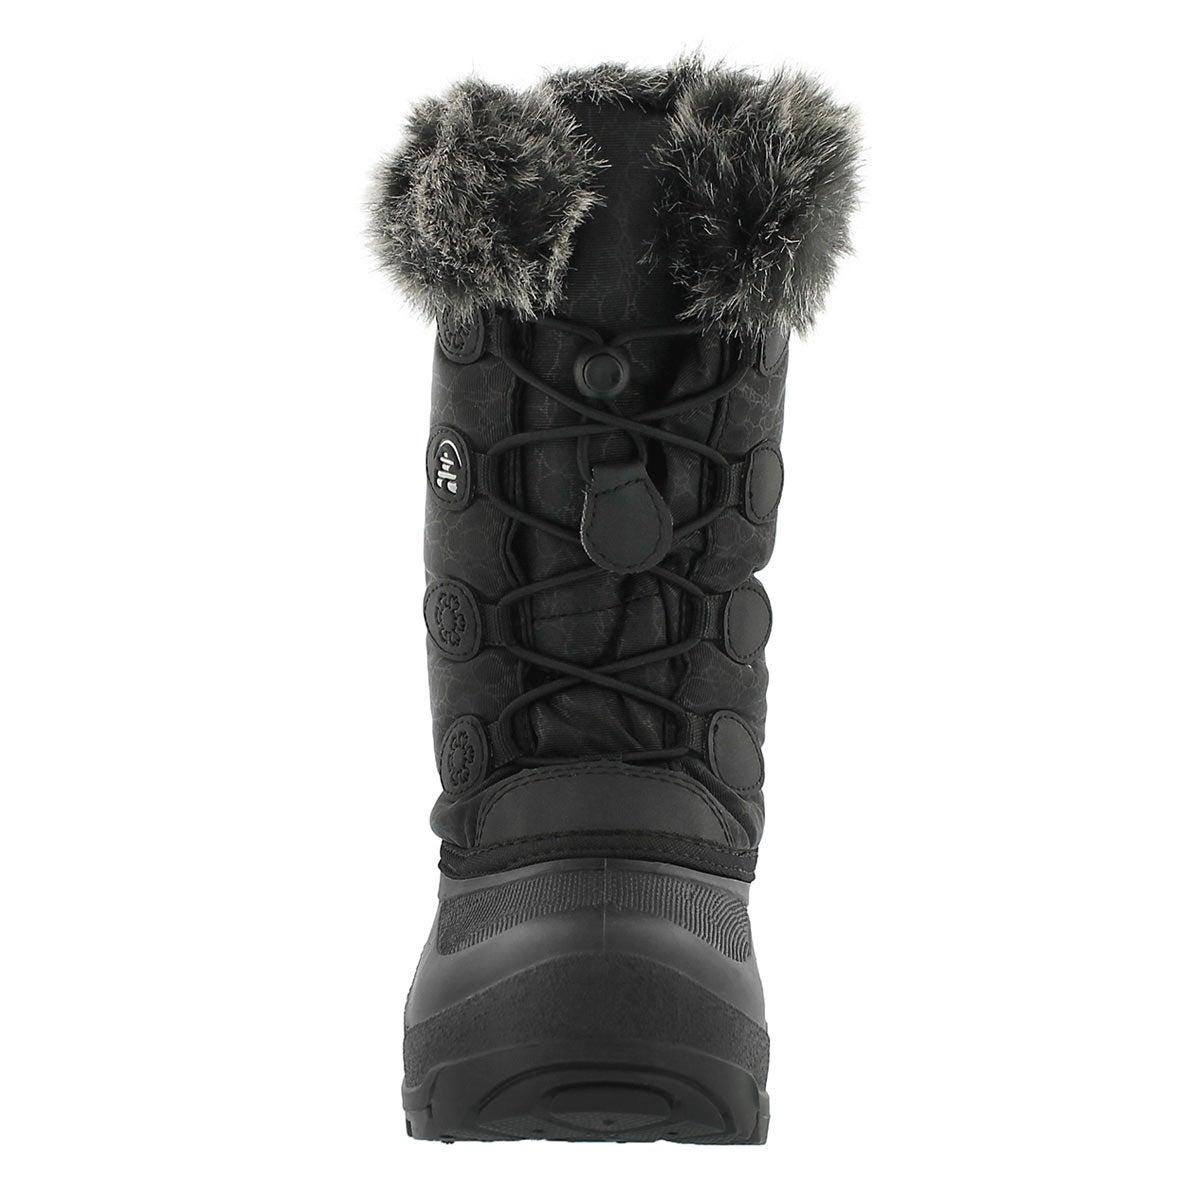 Grls Snowgypsy blk winter boot